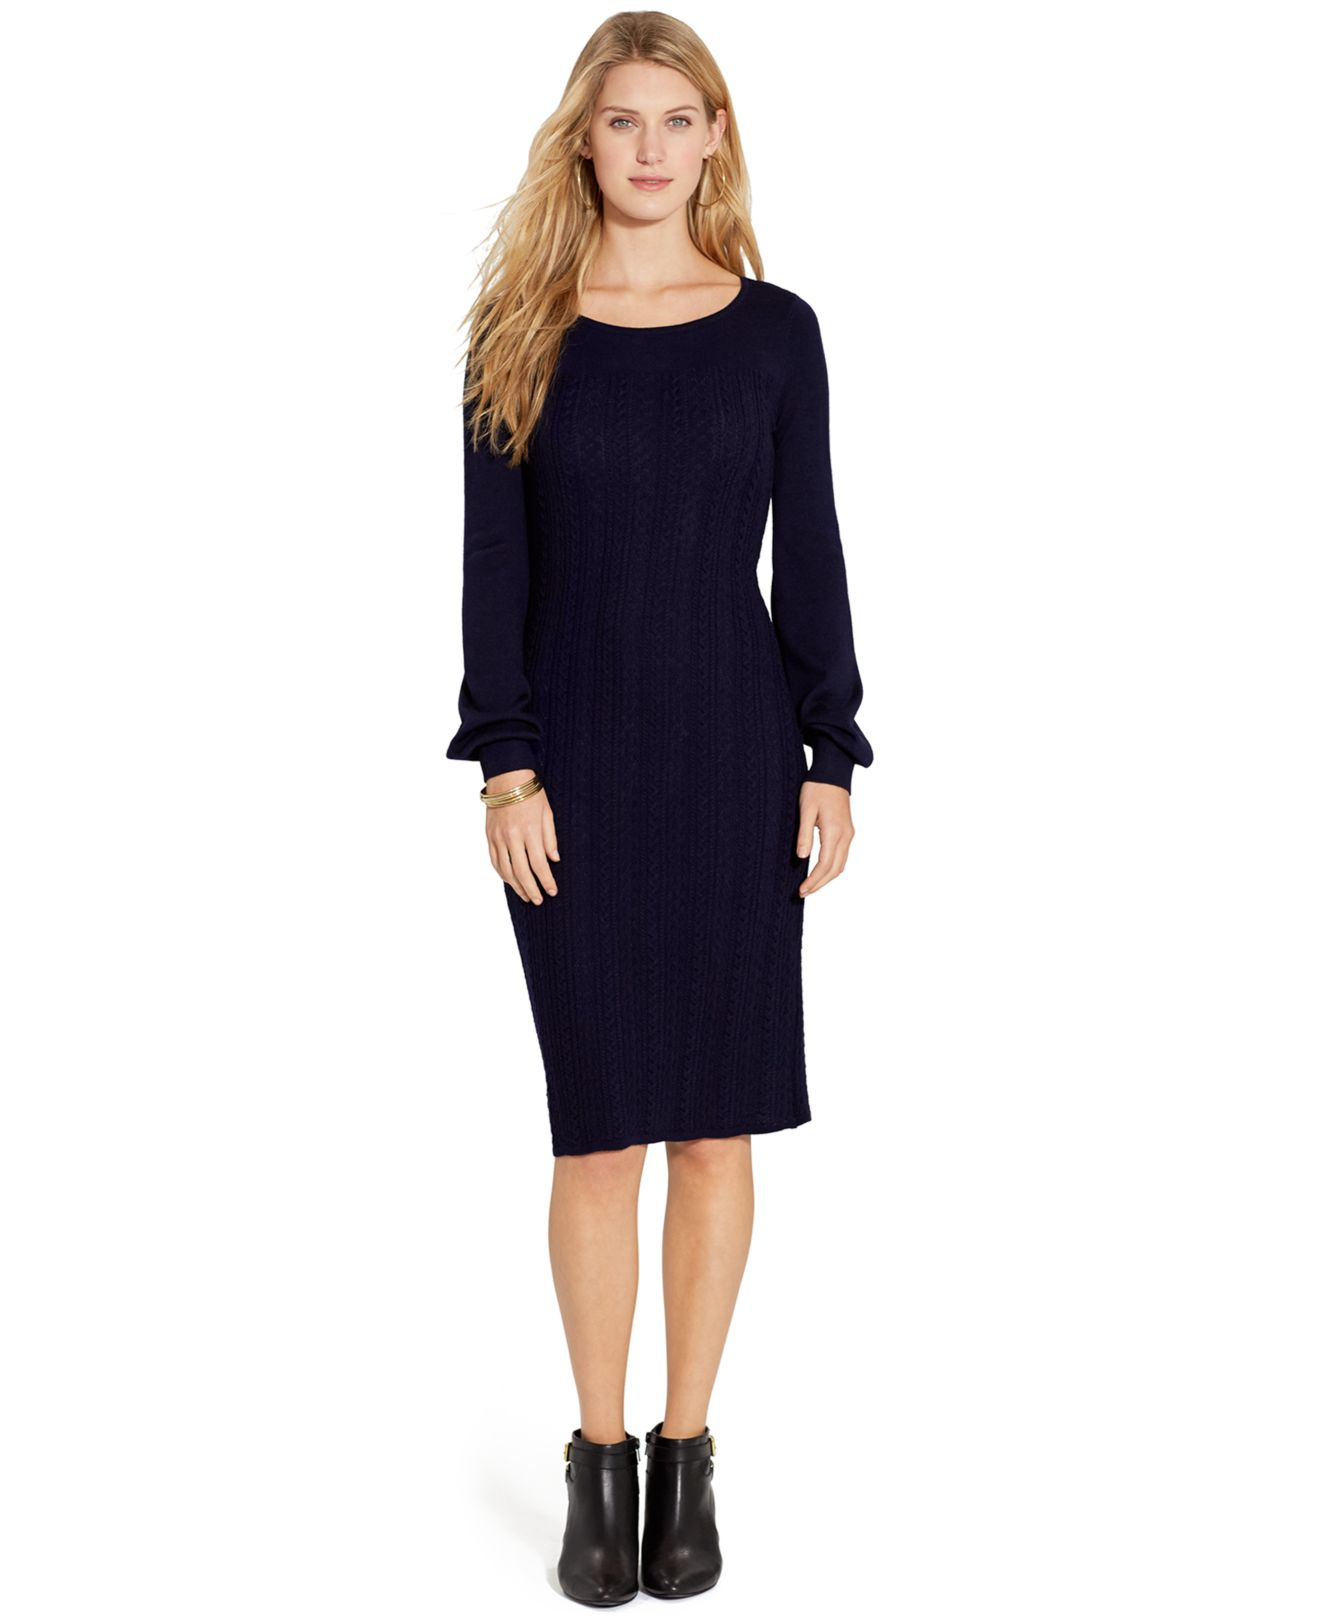 5ab66fbd745 Lyst - Lauren by Ralph Lauren Petite Long-Sleeve Cable-Knit Sweater ...